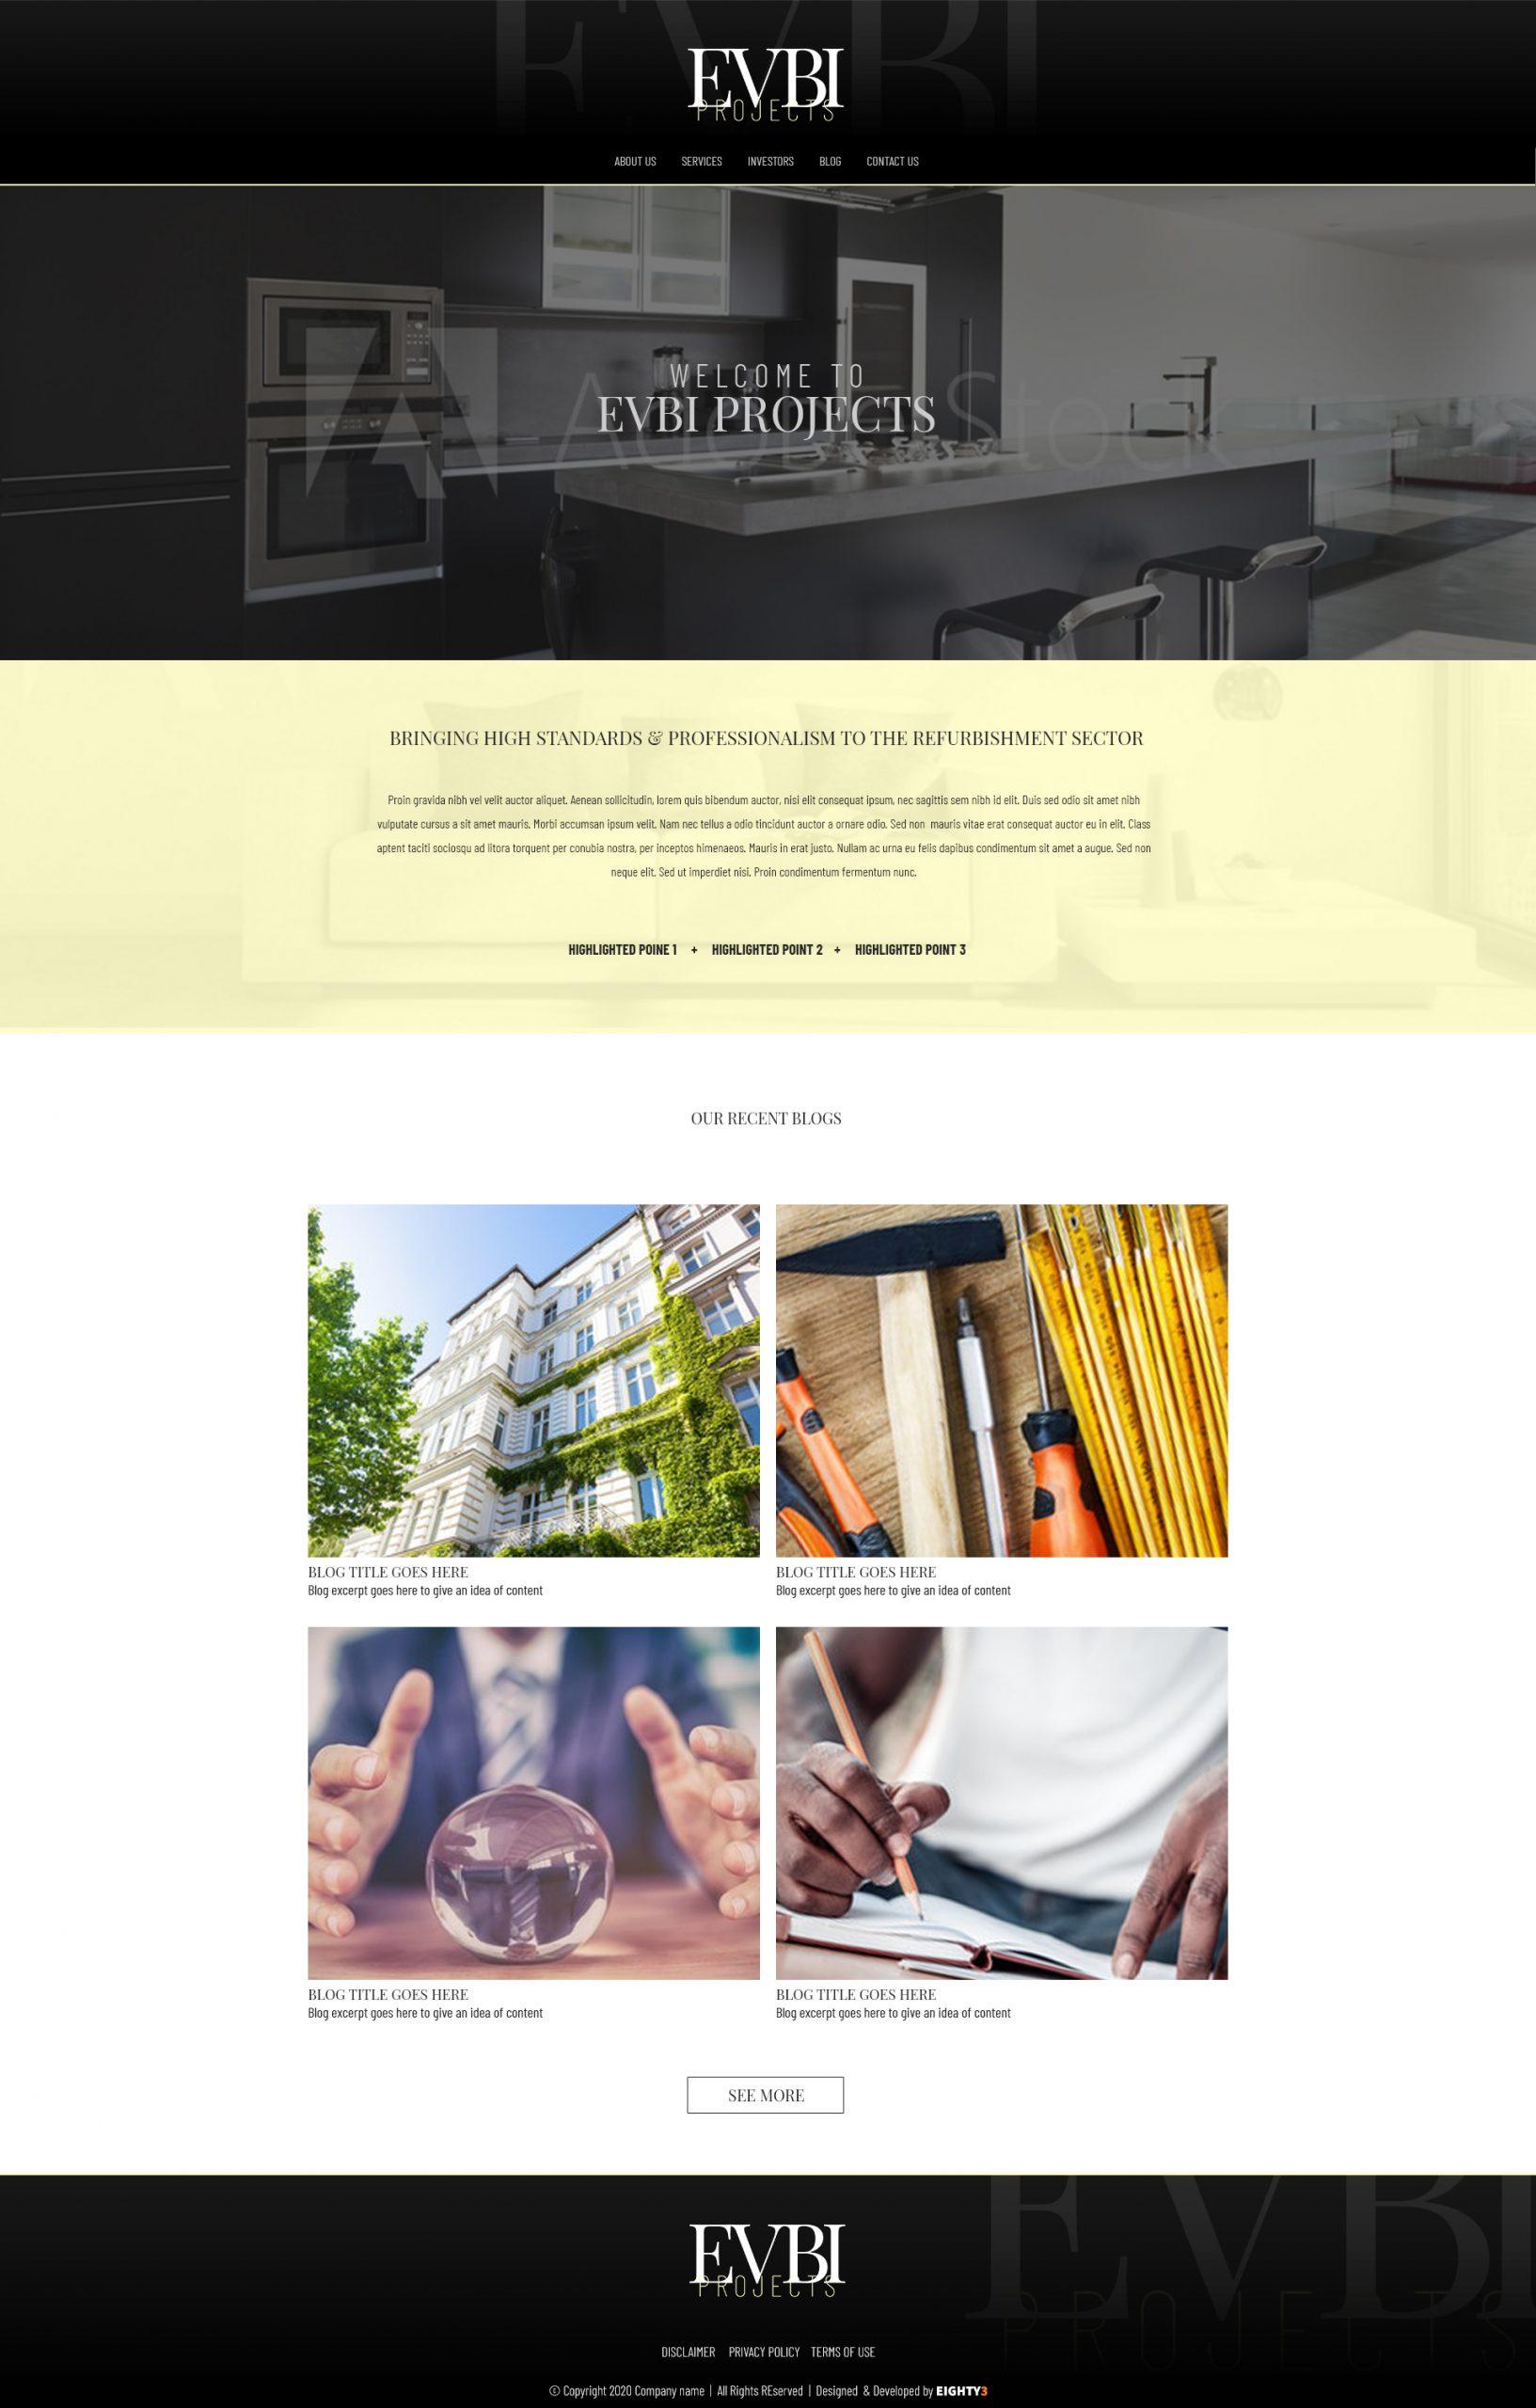 Evbi Projects - Custom Website Design with blog